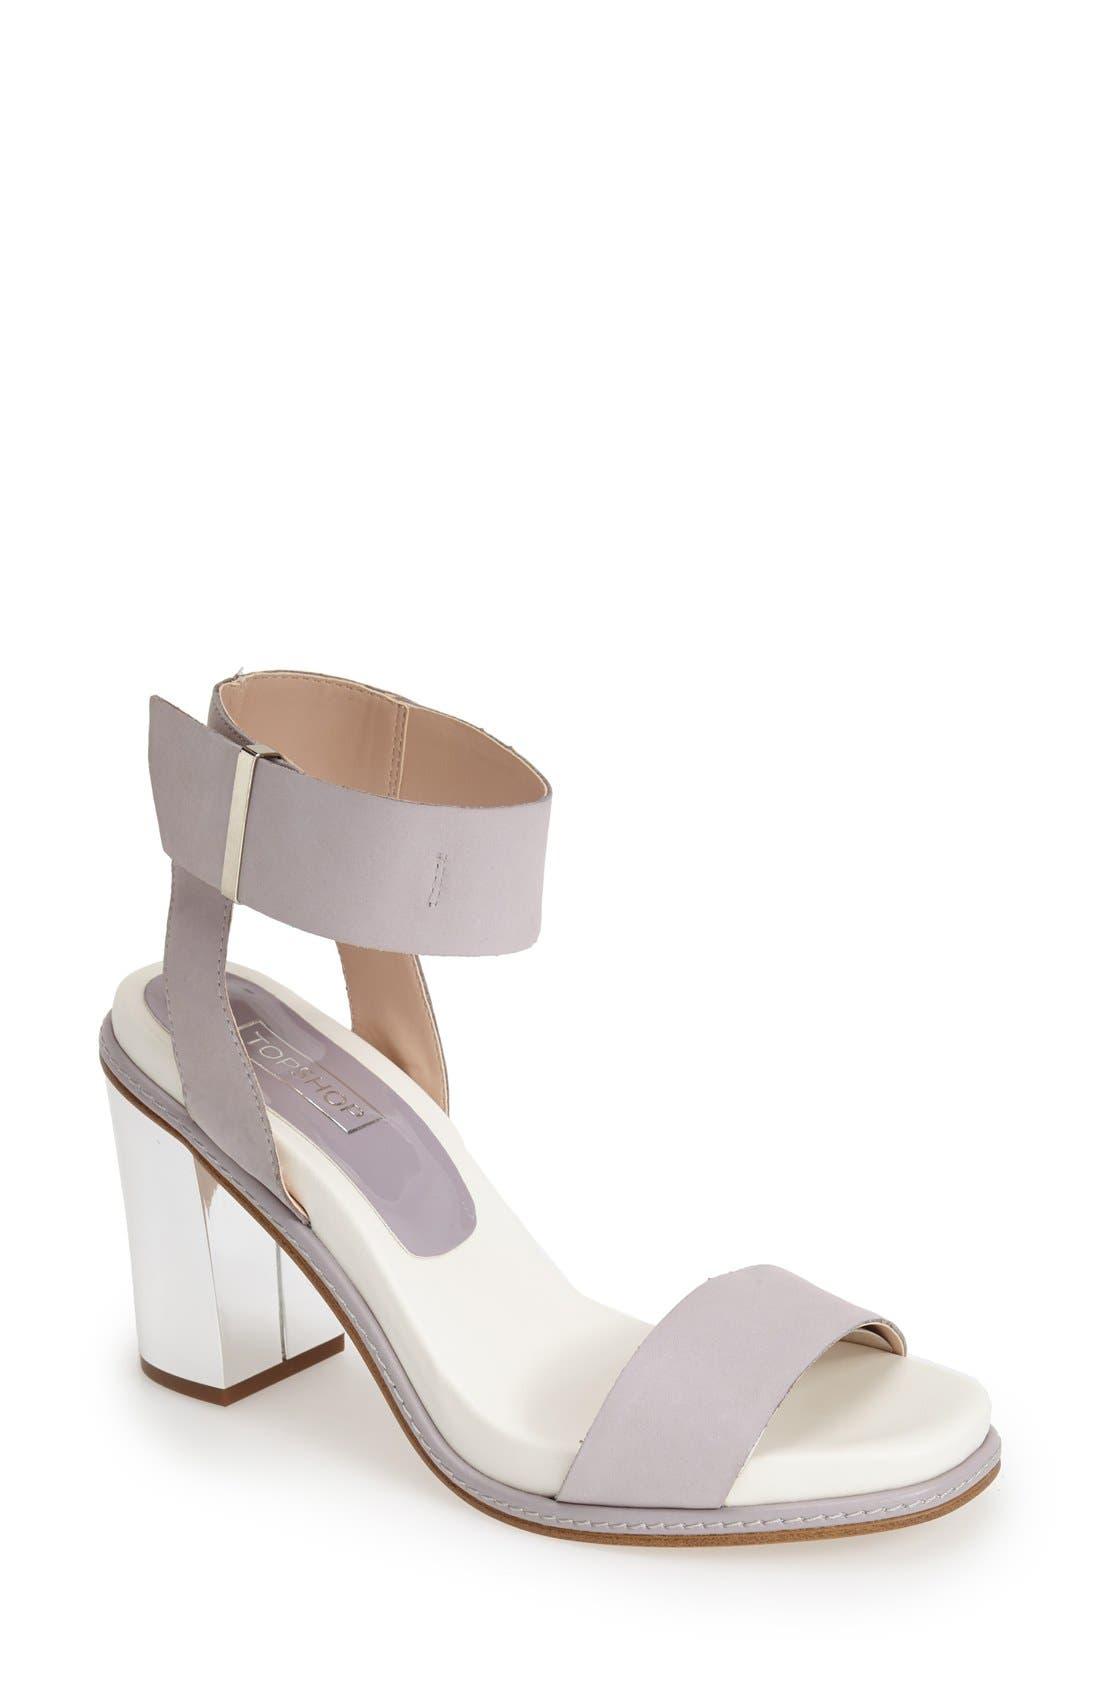 Main Image - Topshop 'Reflect' Metallic Heel Leather Sandal (Women)